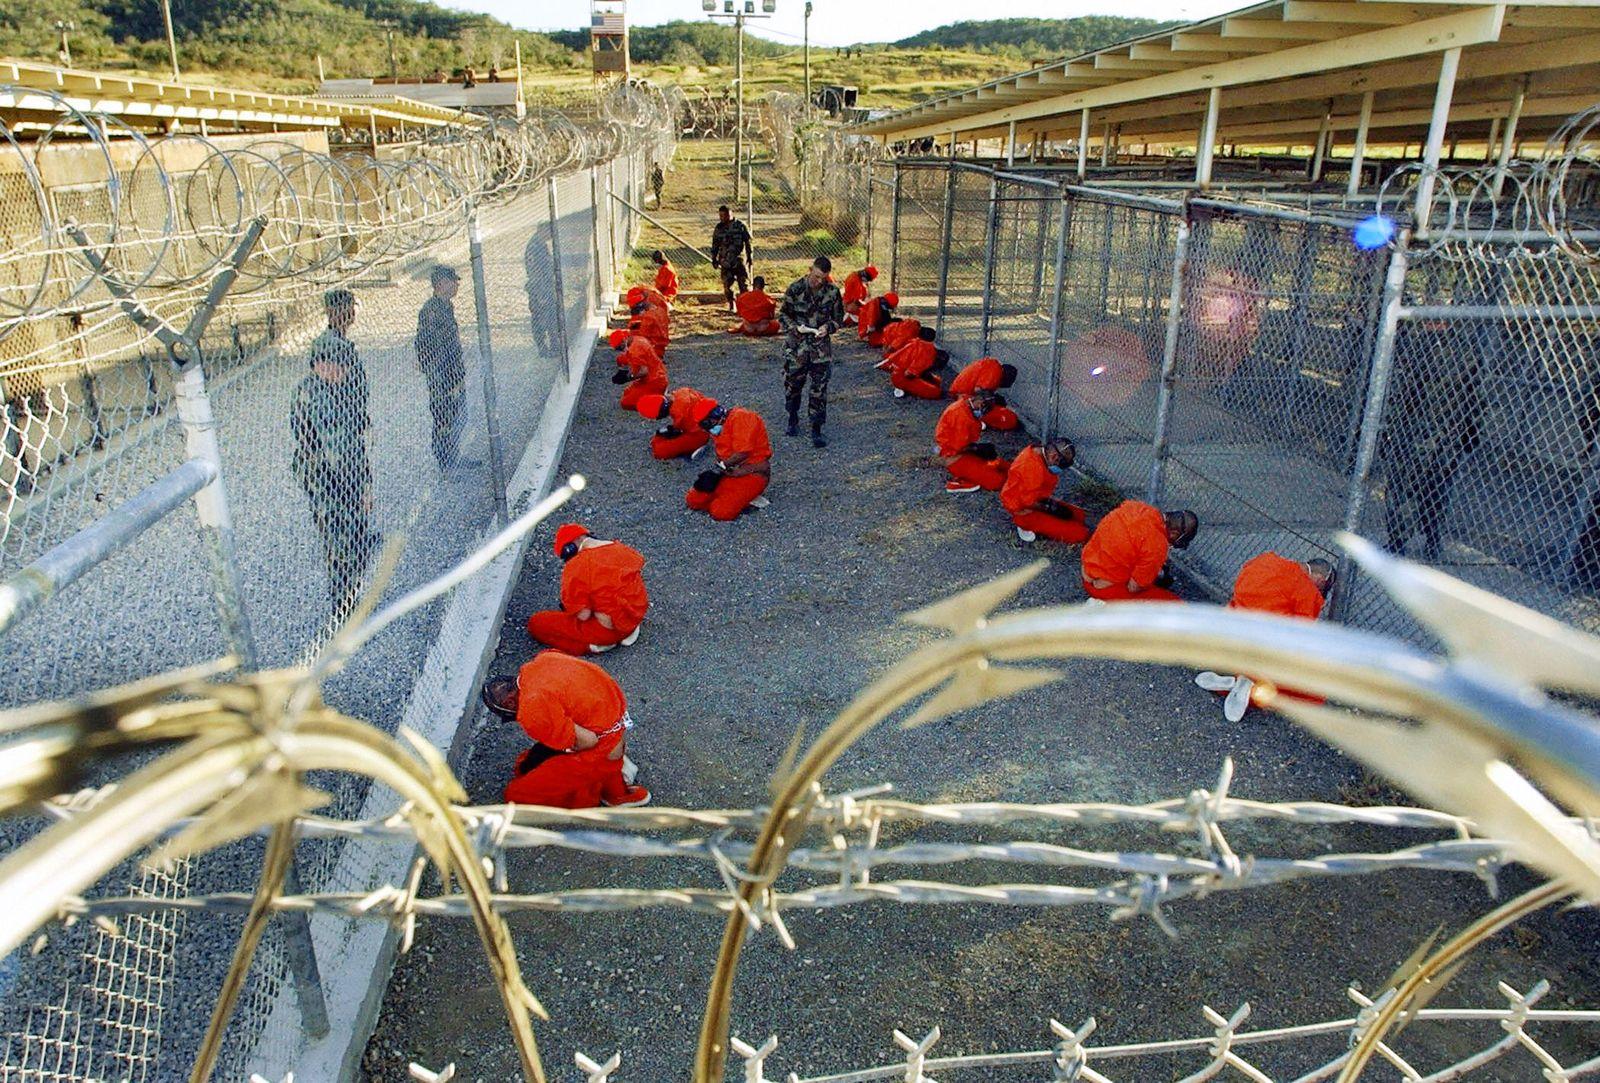 Yassin/ Jahrzehnt/ Guantanamo